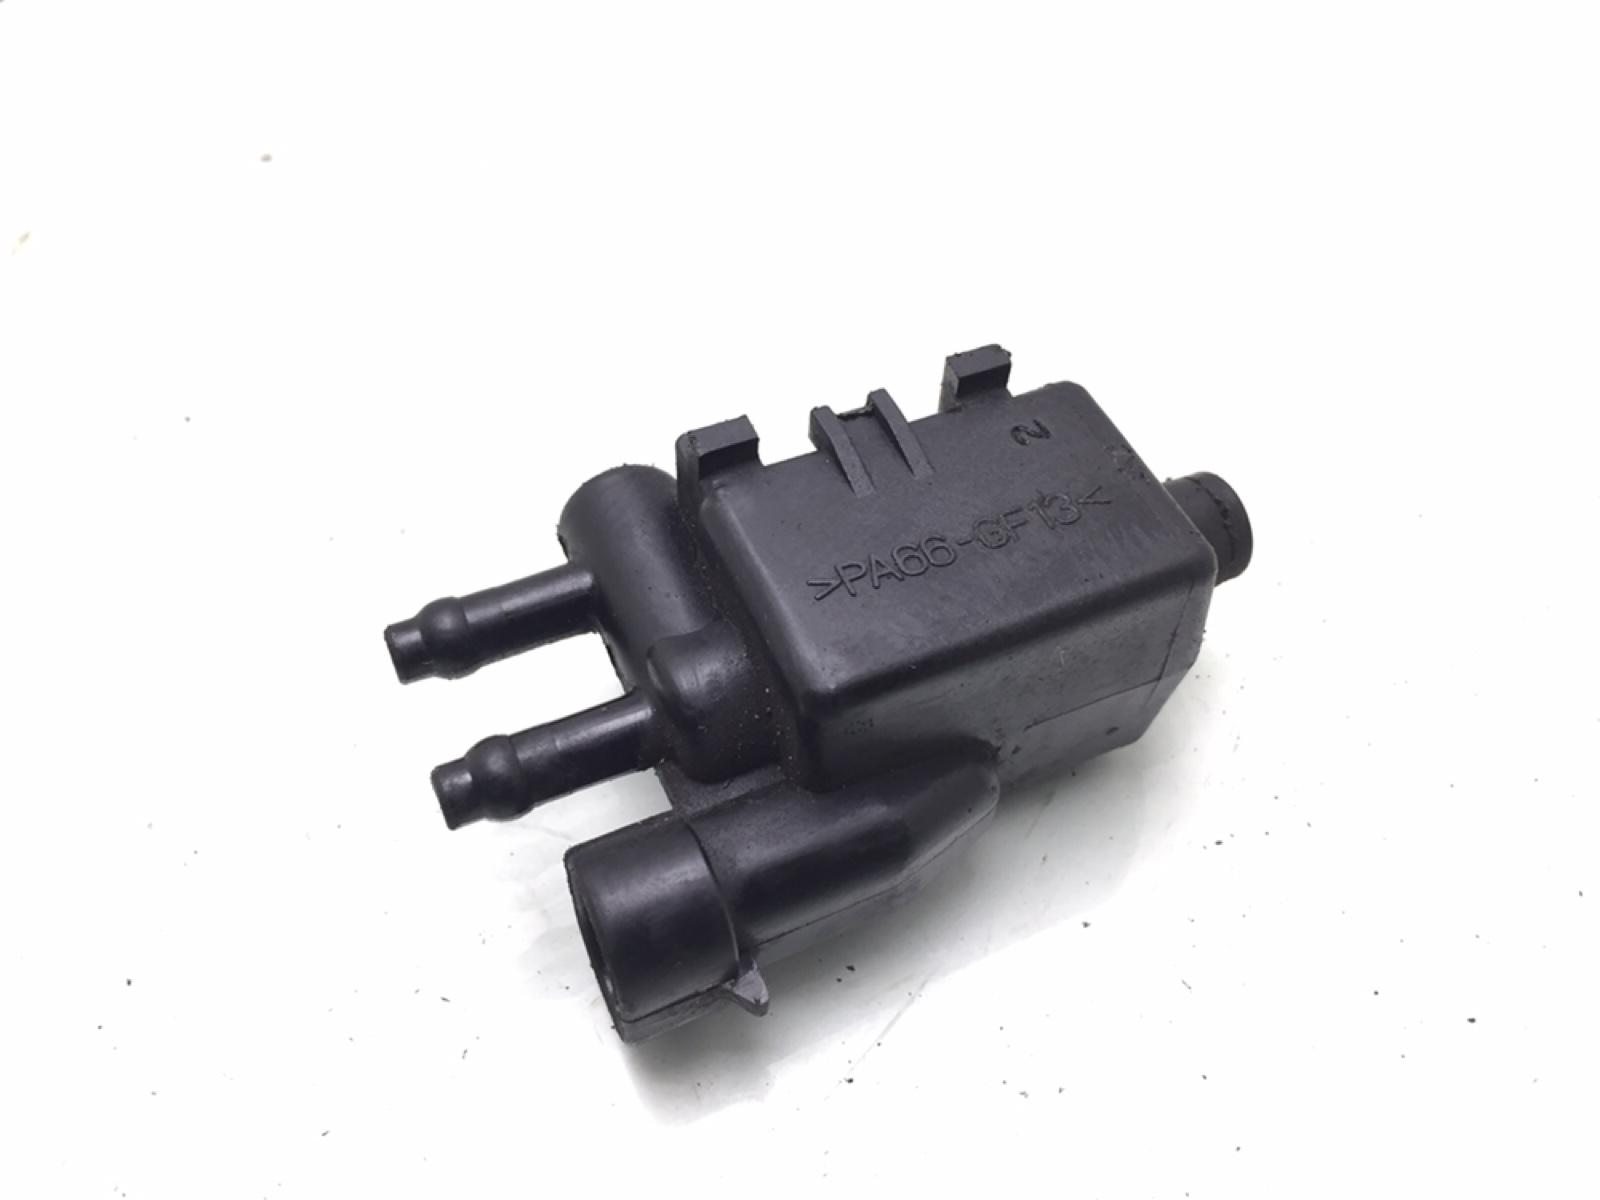 Клапан вентиляции топливного бака Chevrolet Aveo 1.4 I 2005 (б/у)